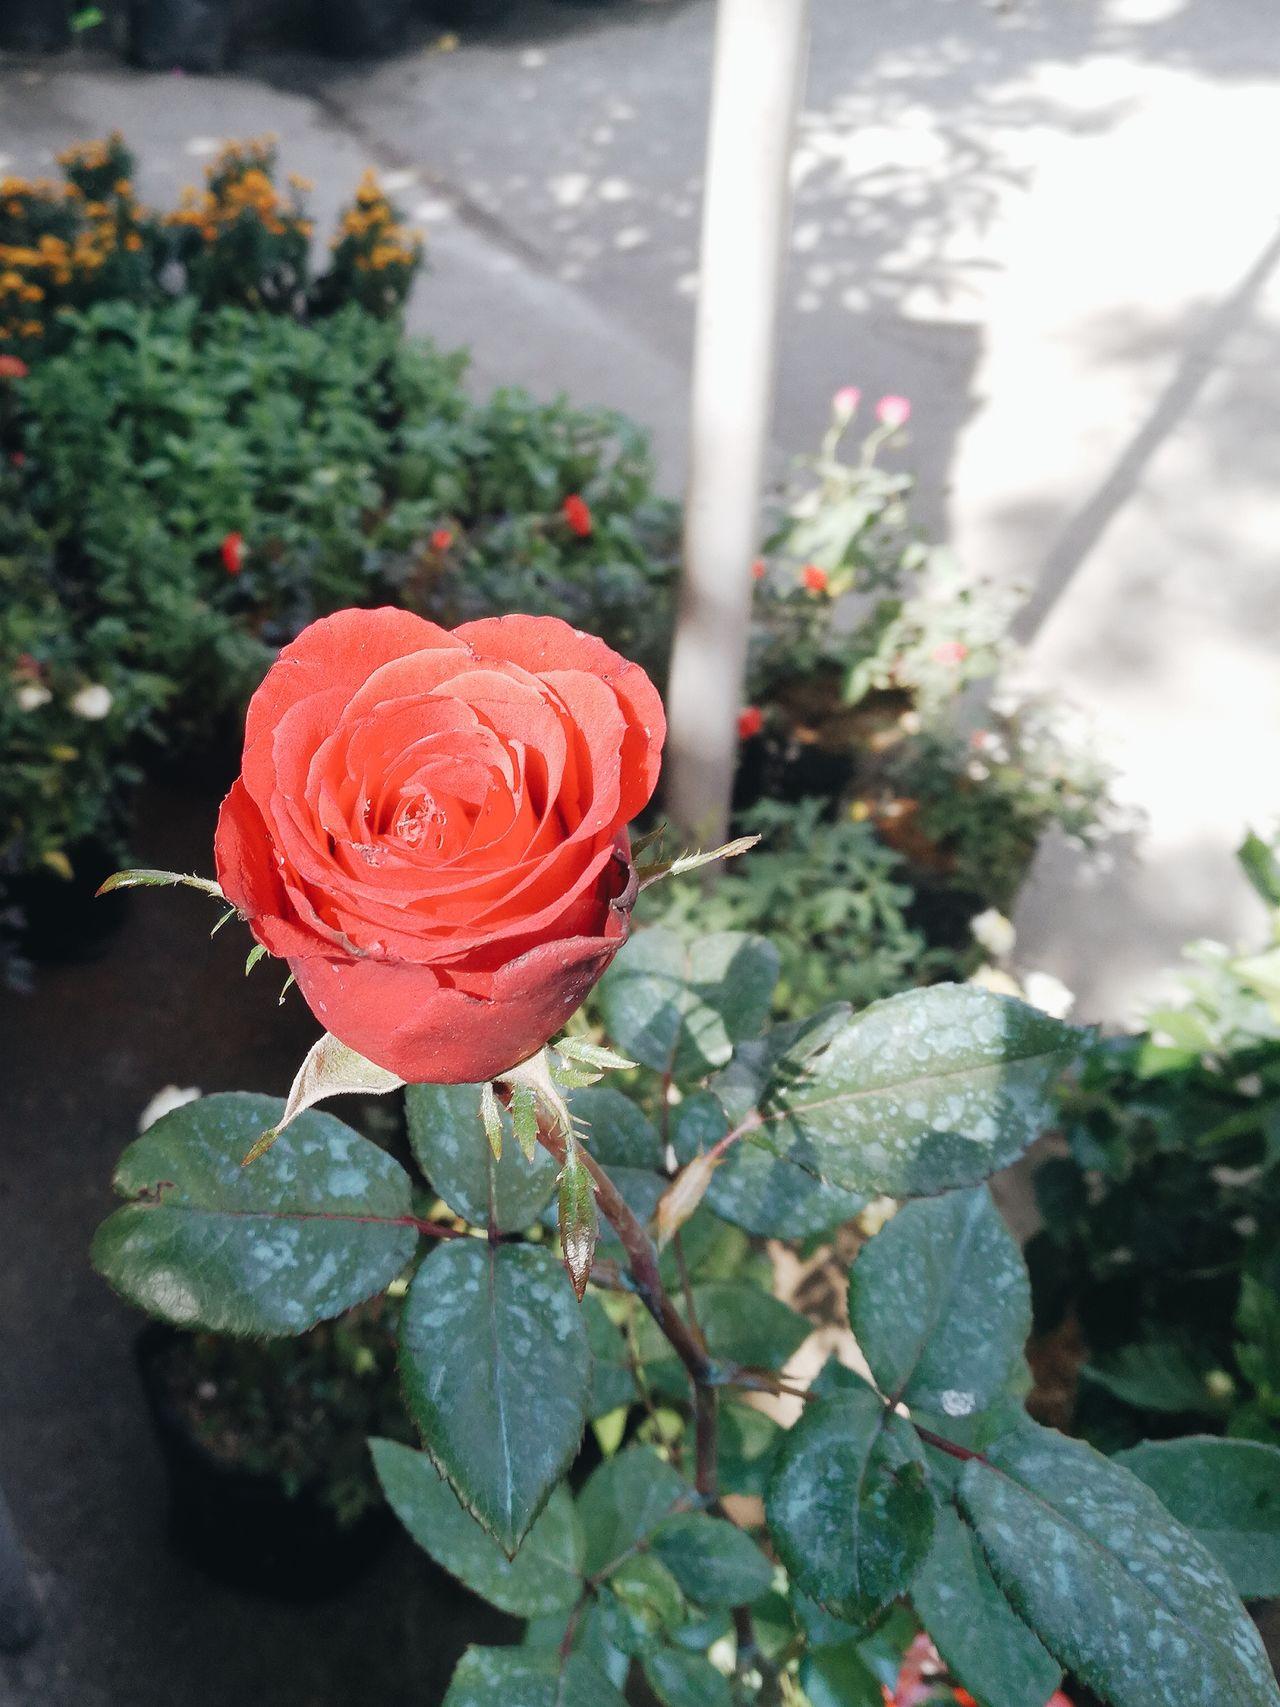 Rose Plant Flower Rosé Flora Market Garden Blooming